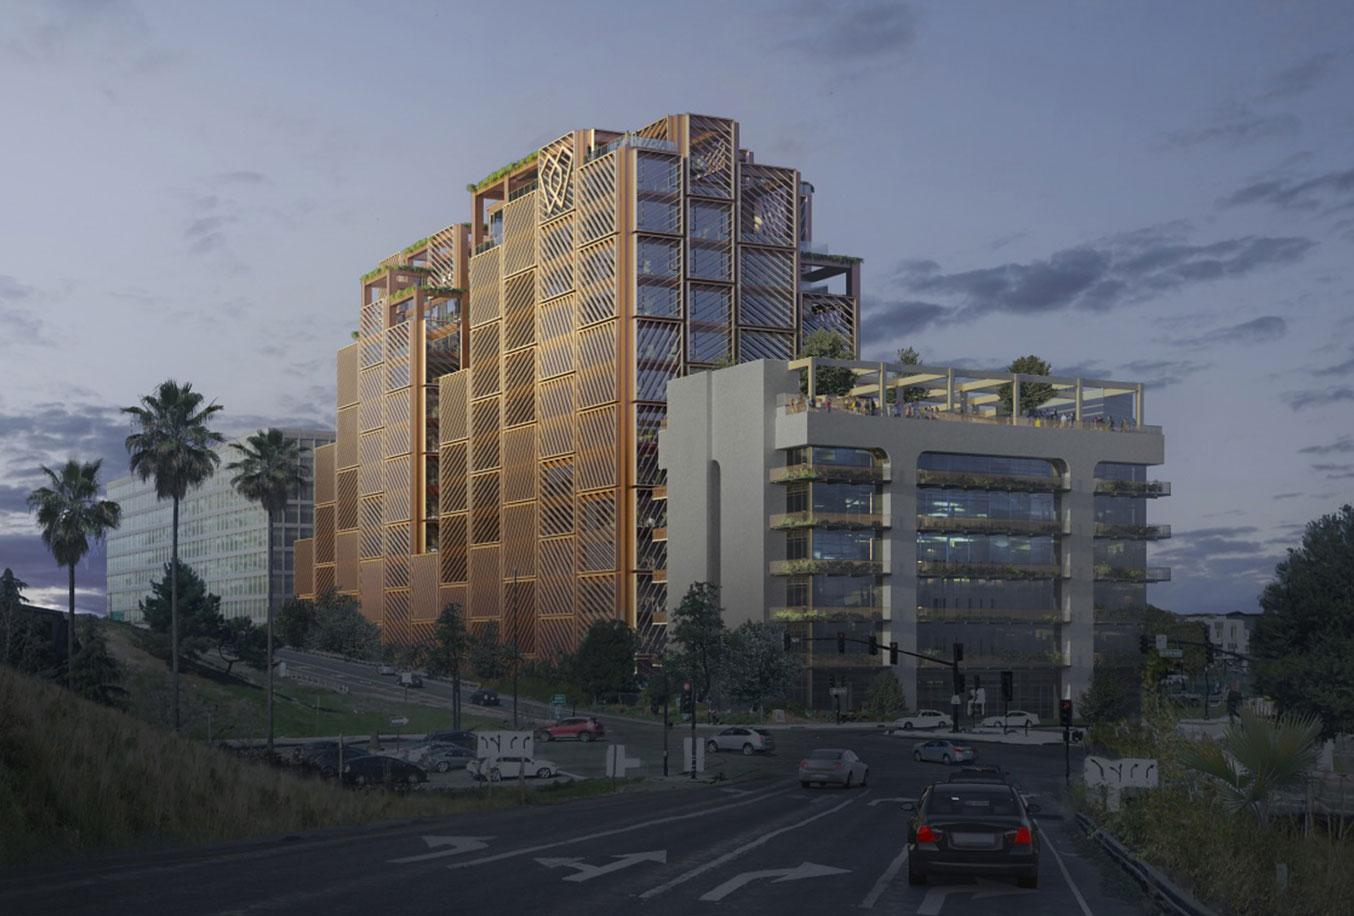 Arbor Westbank San Jose Rendering Mass Timber High-Rise by Studio Gang